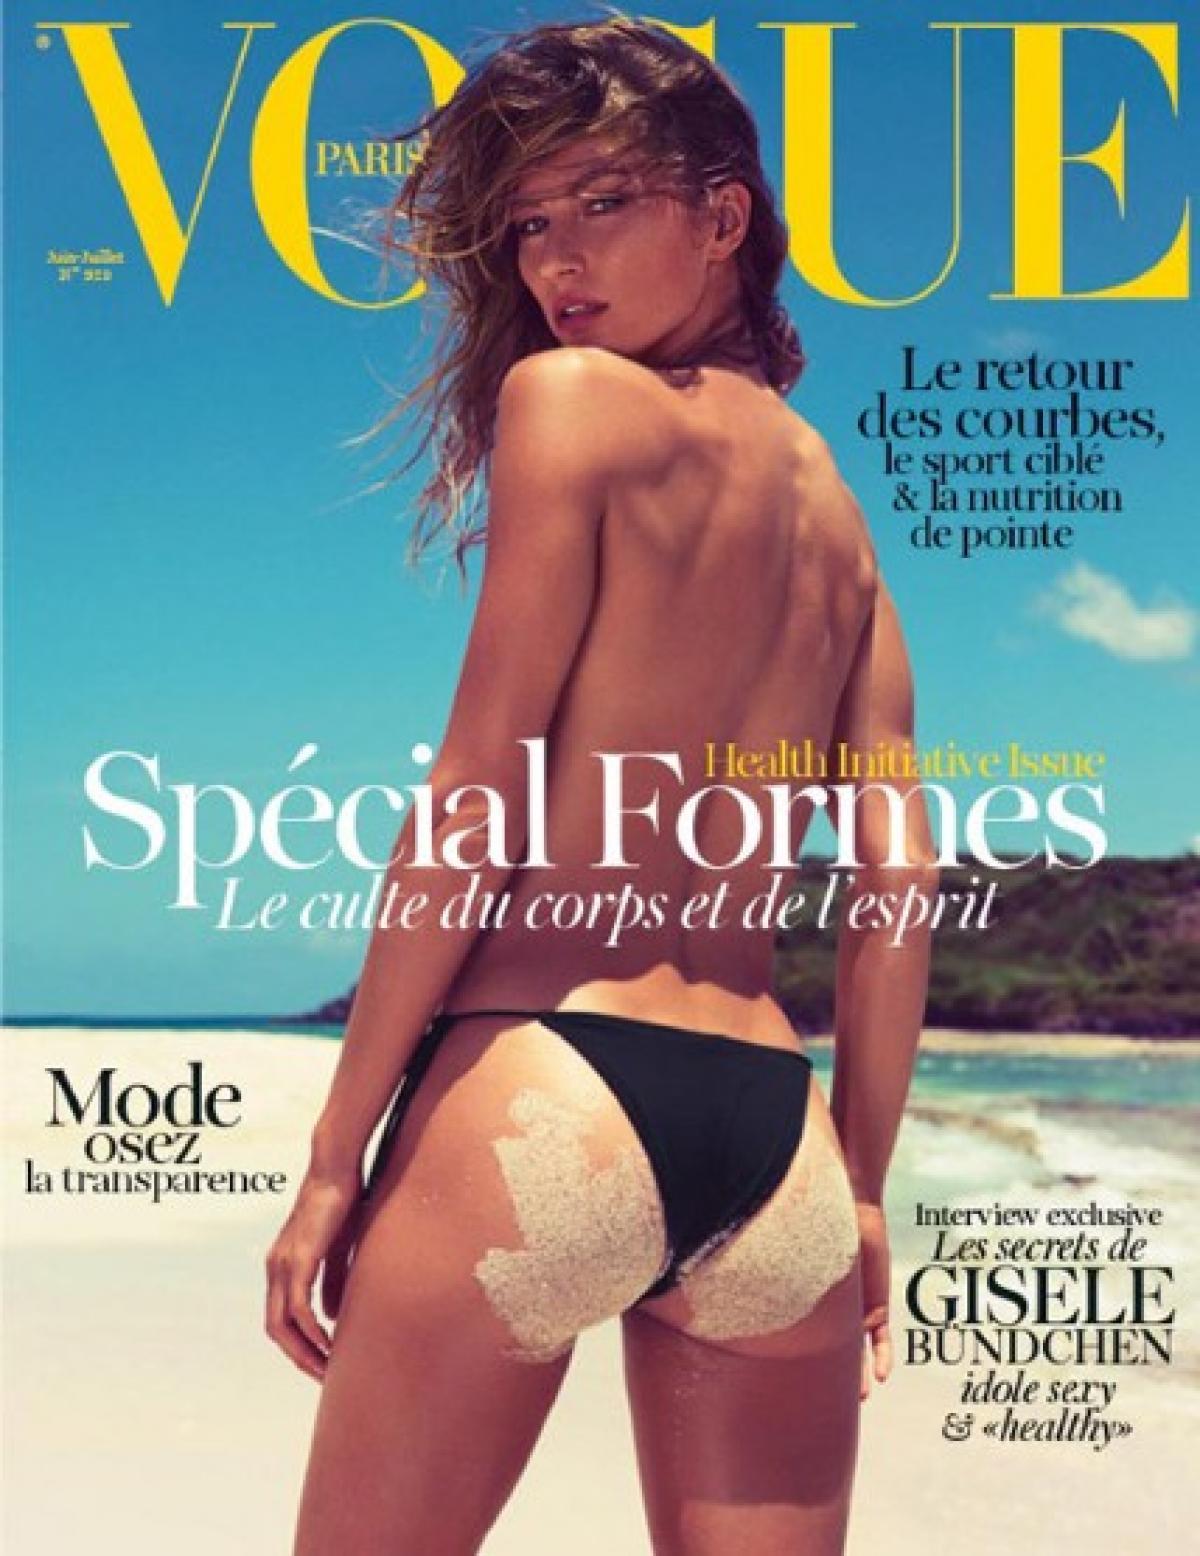 Vogue 2012 june